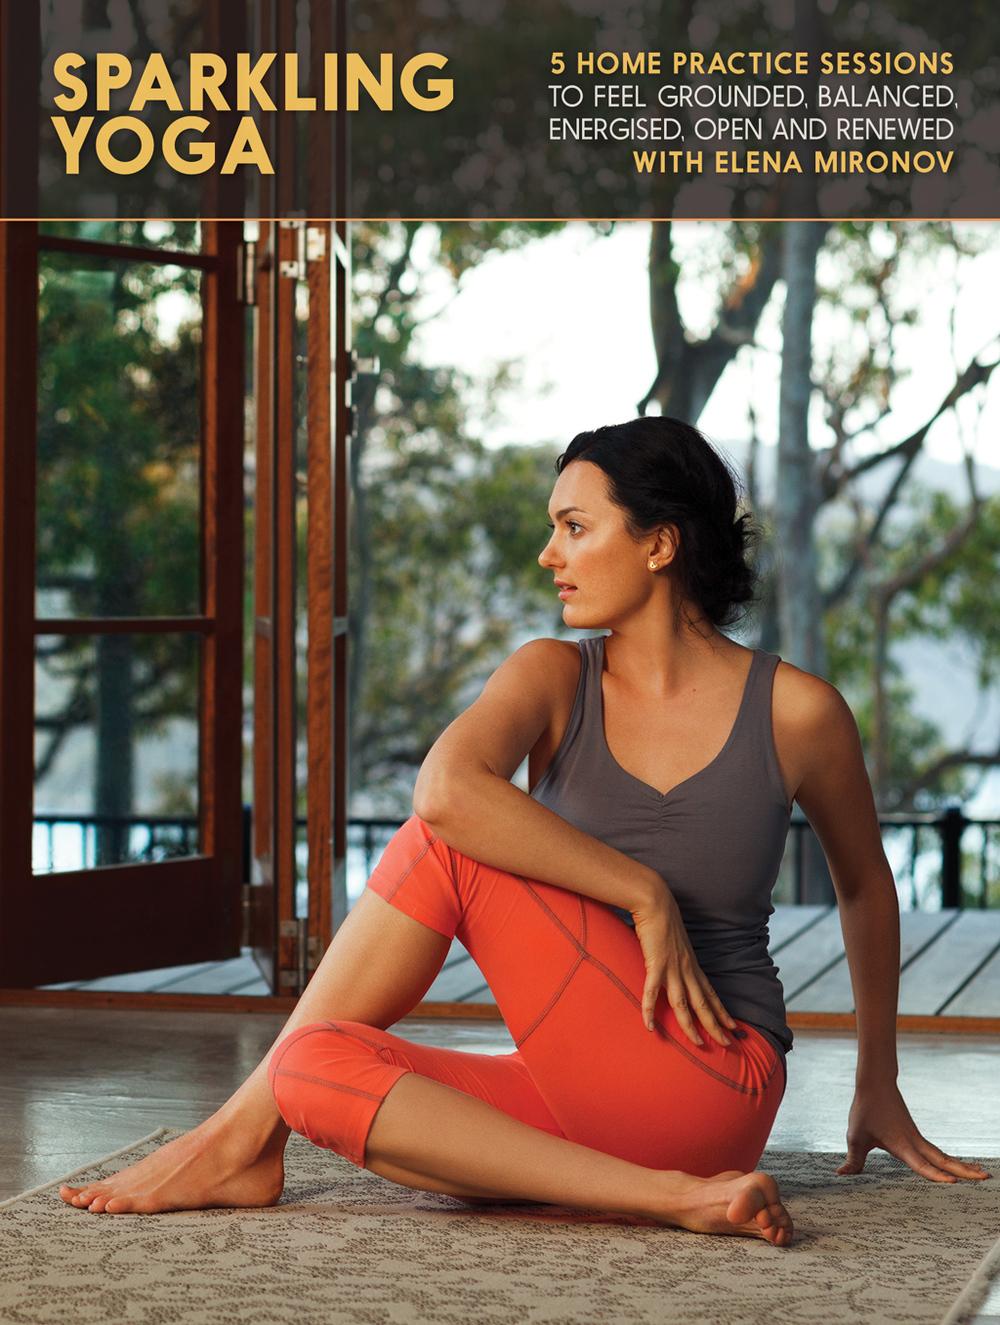 Sparkling Yoga DVD